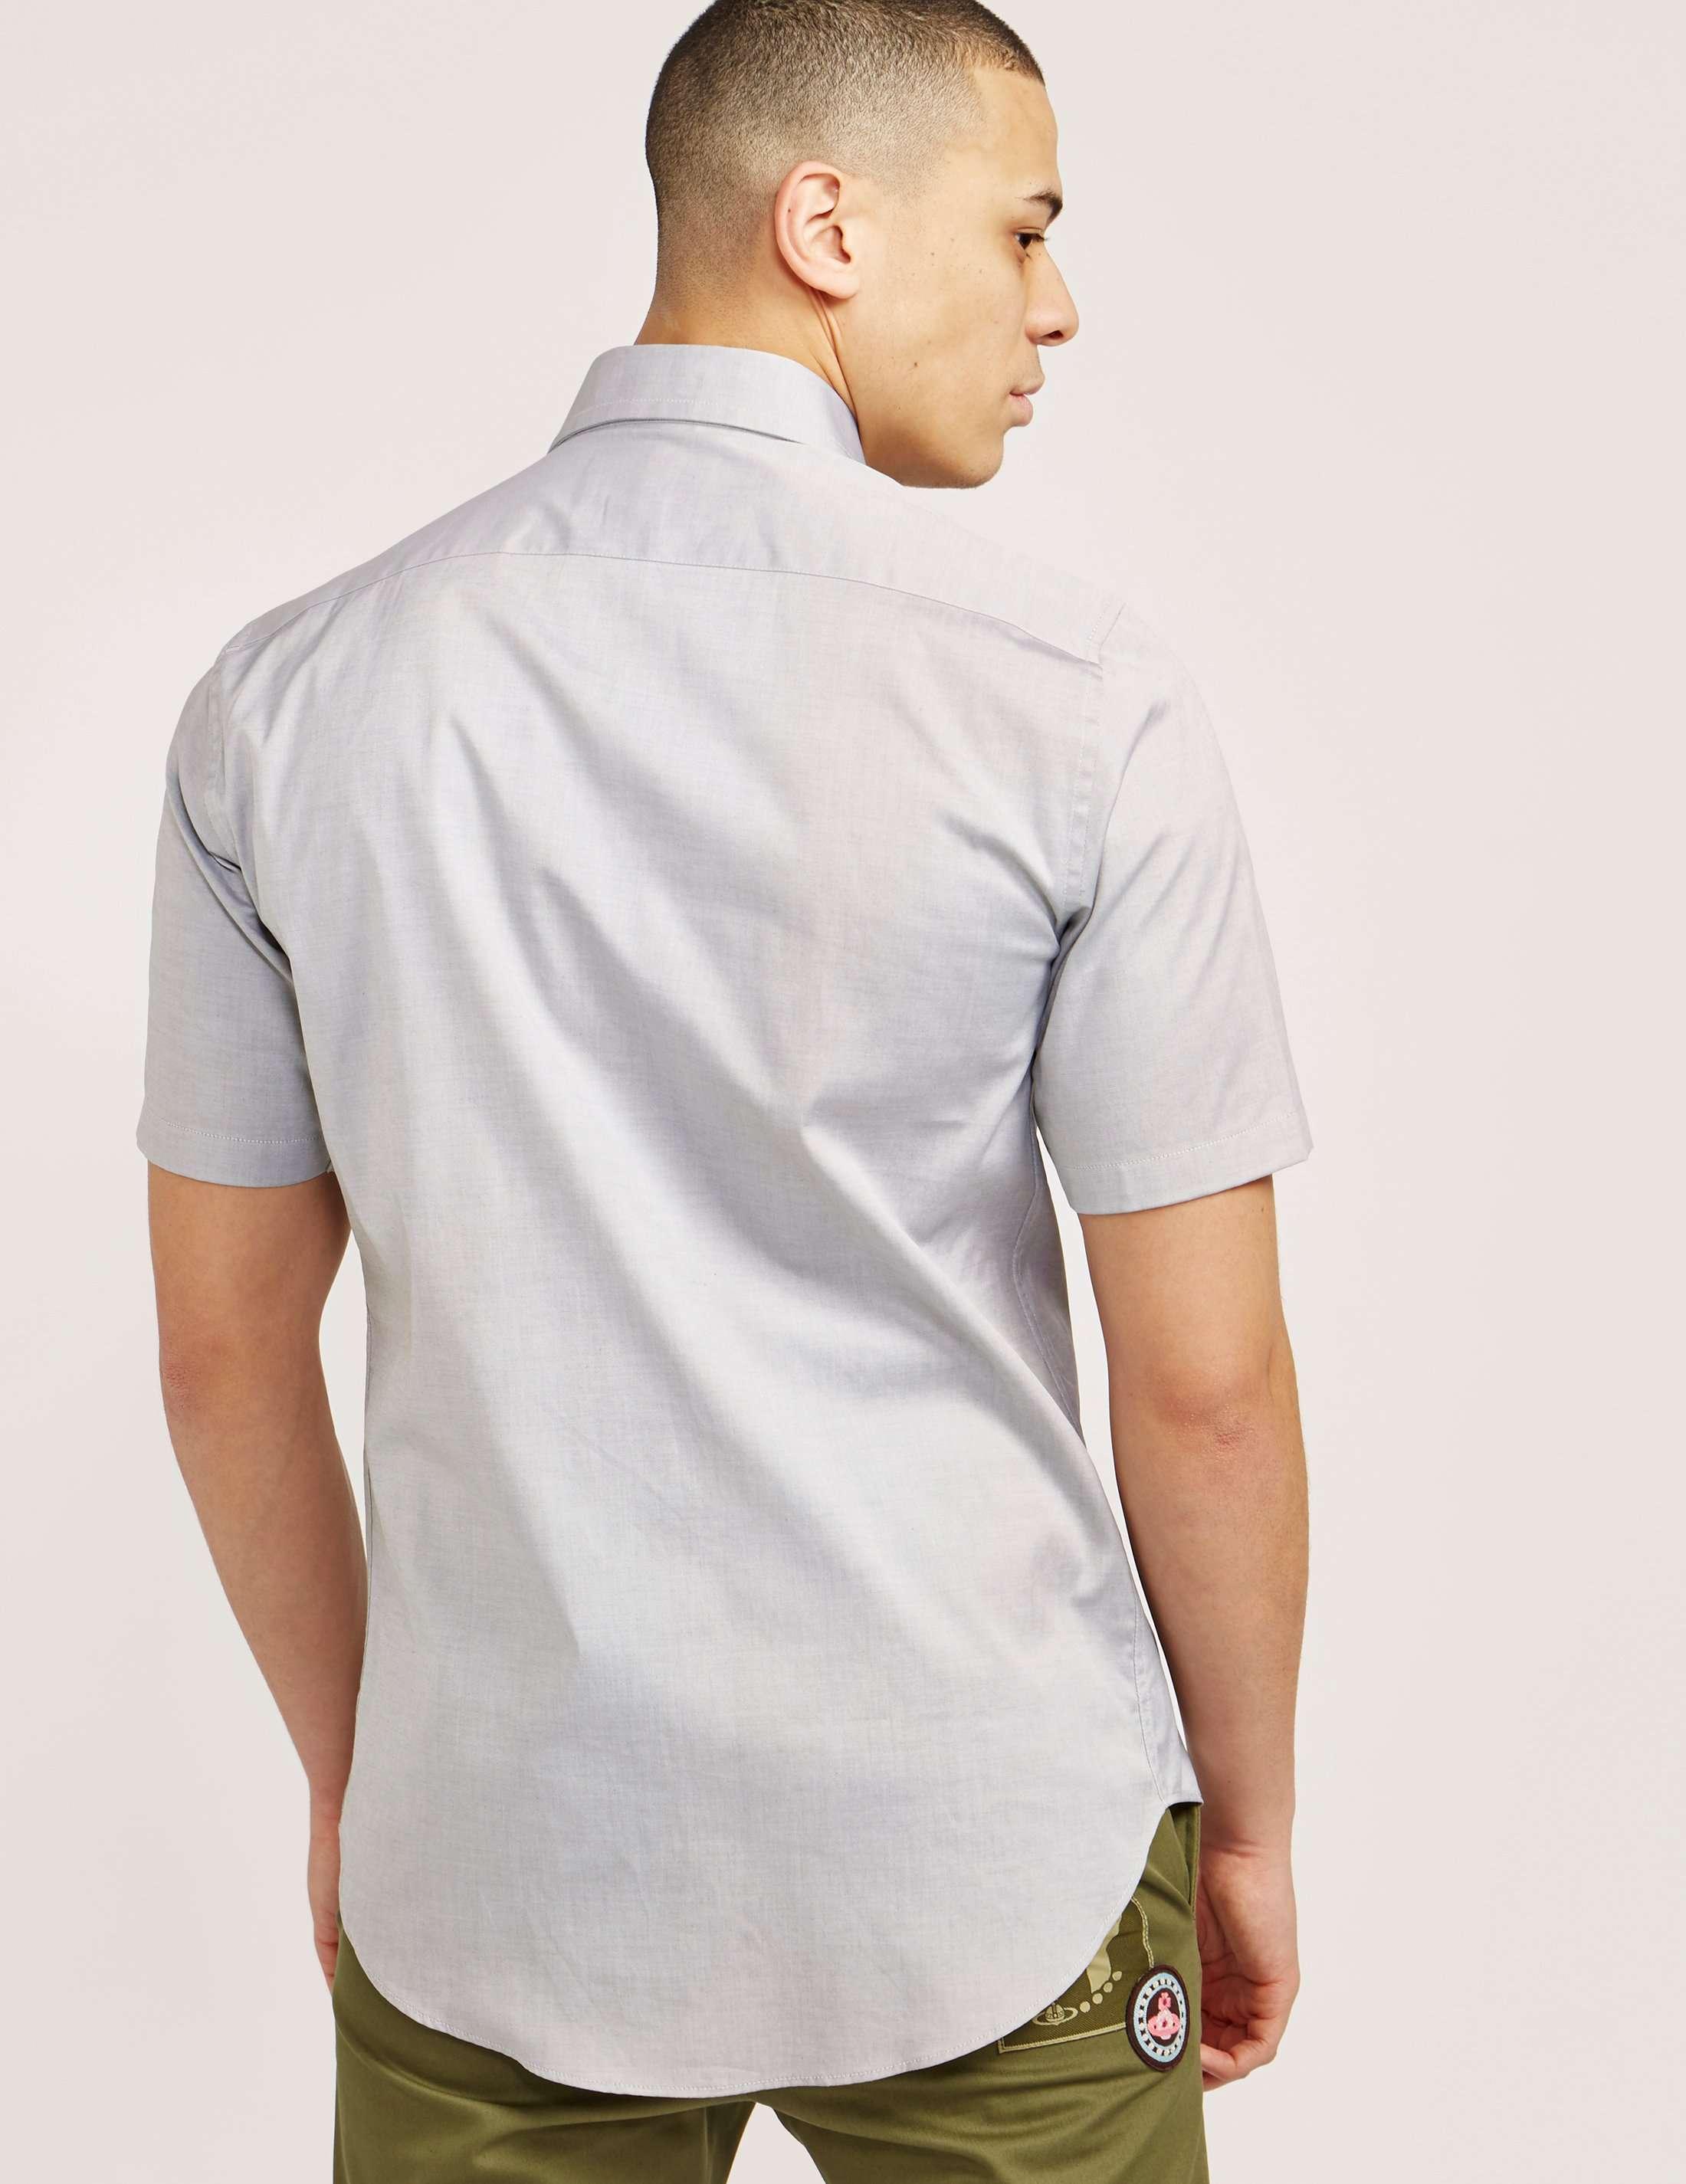 Vivienne Westwood Rattle Shirt